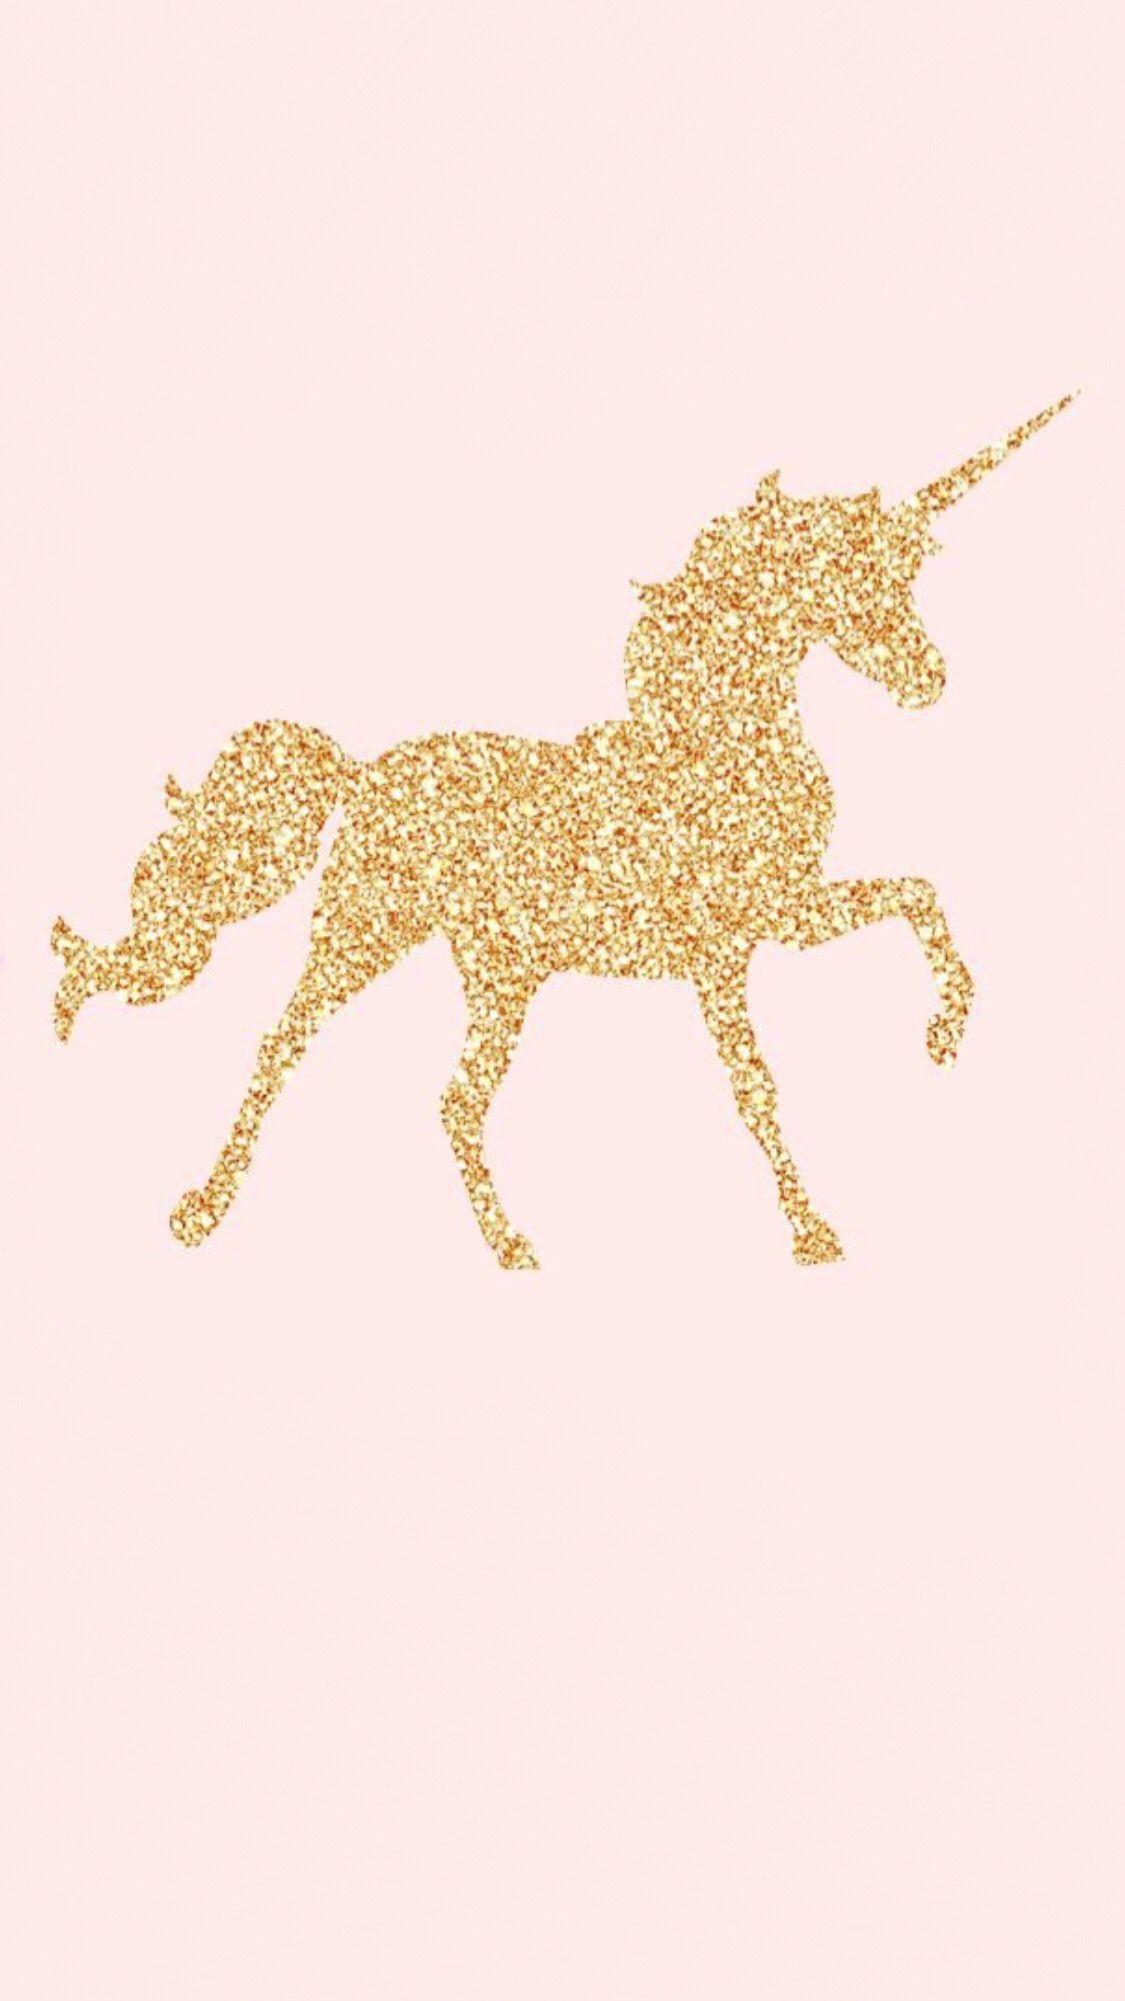 Explore More Wallpapers Pink Unicorn Wallpaper Unicorn Wallpaper Cute Unicorn Wallpaper